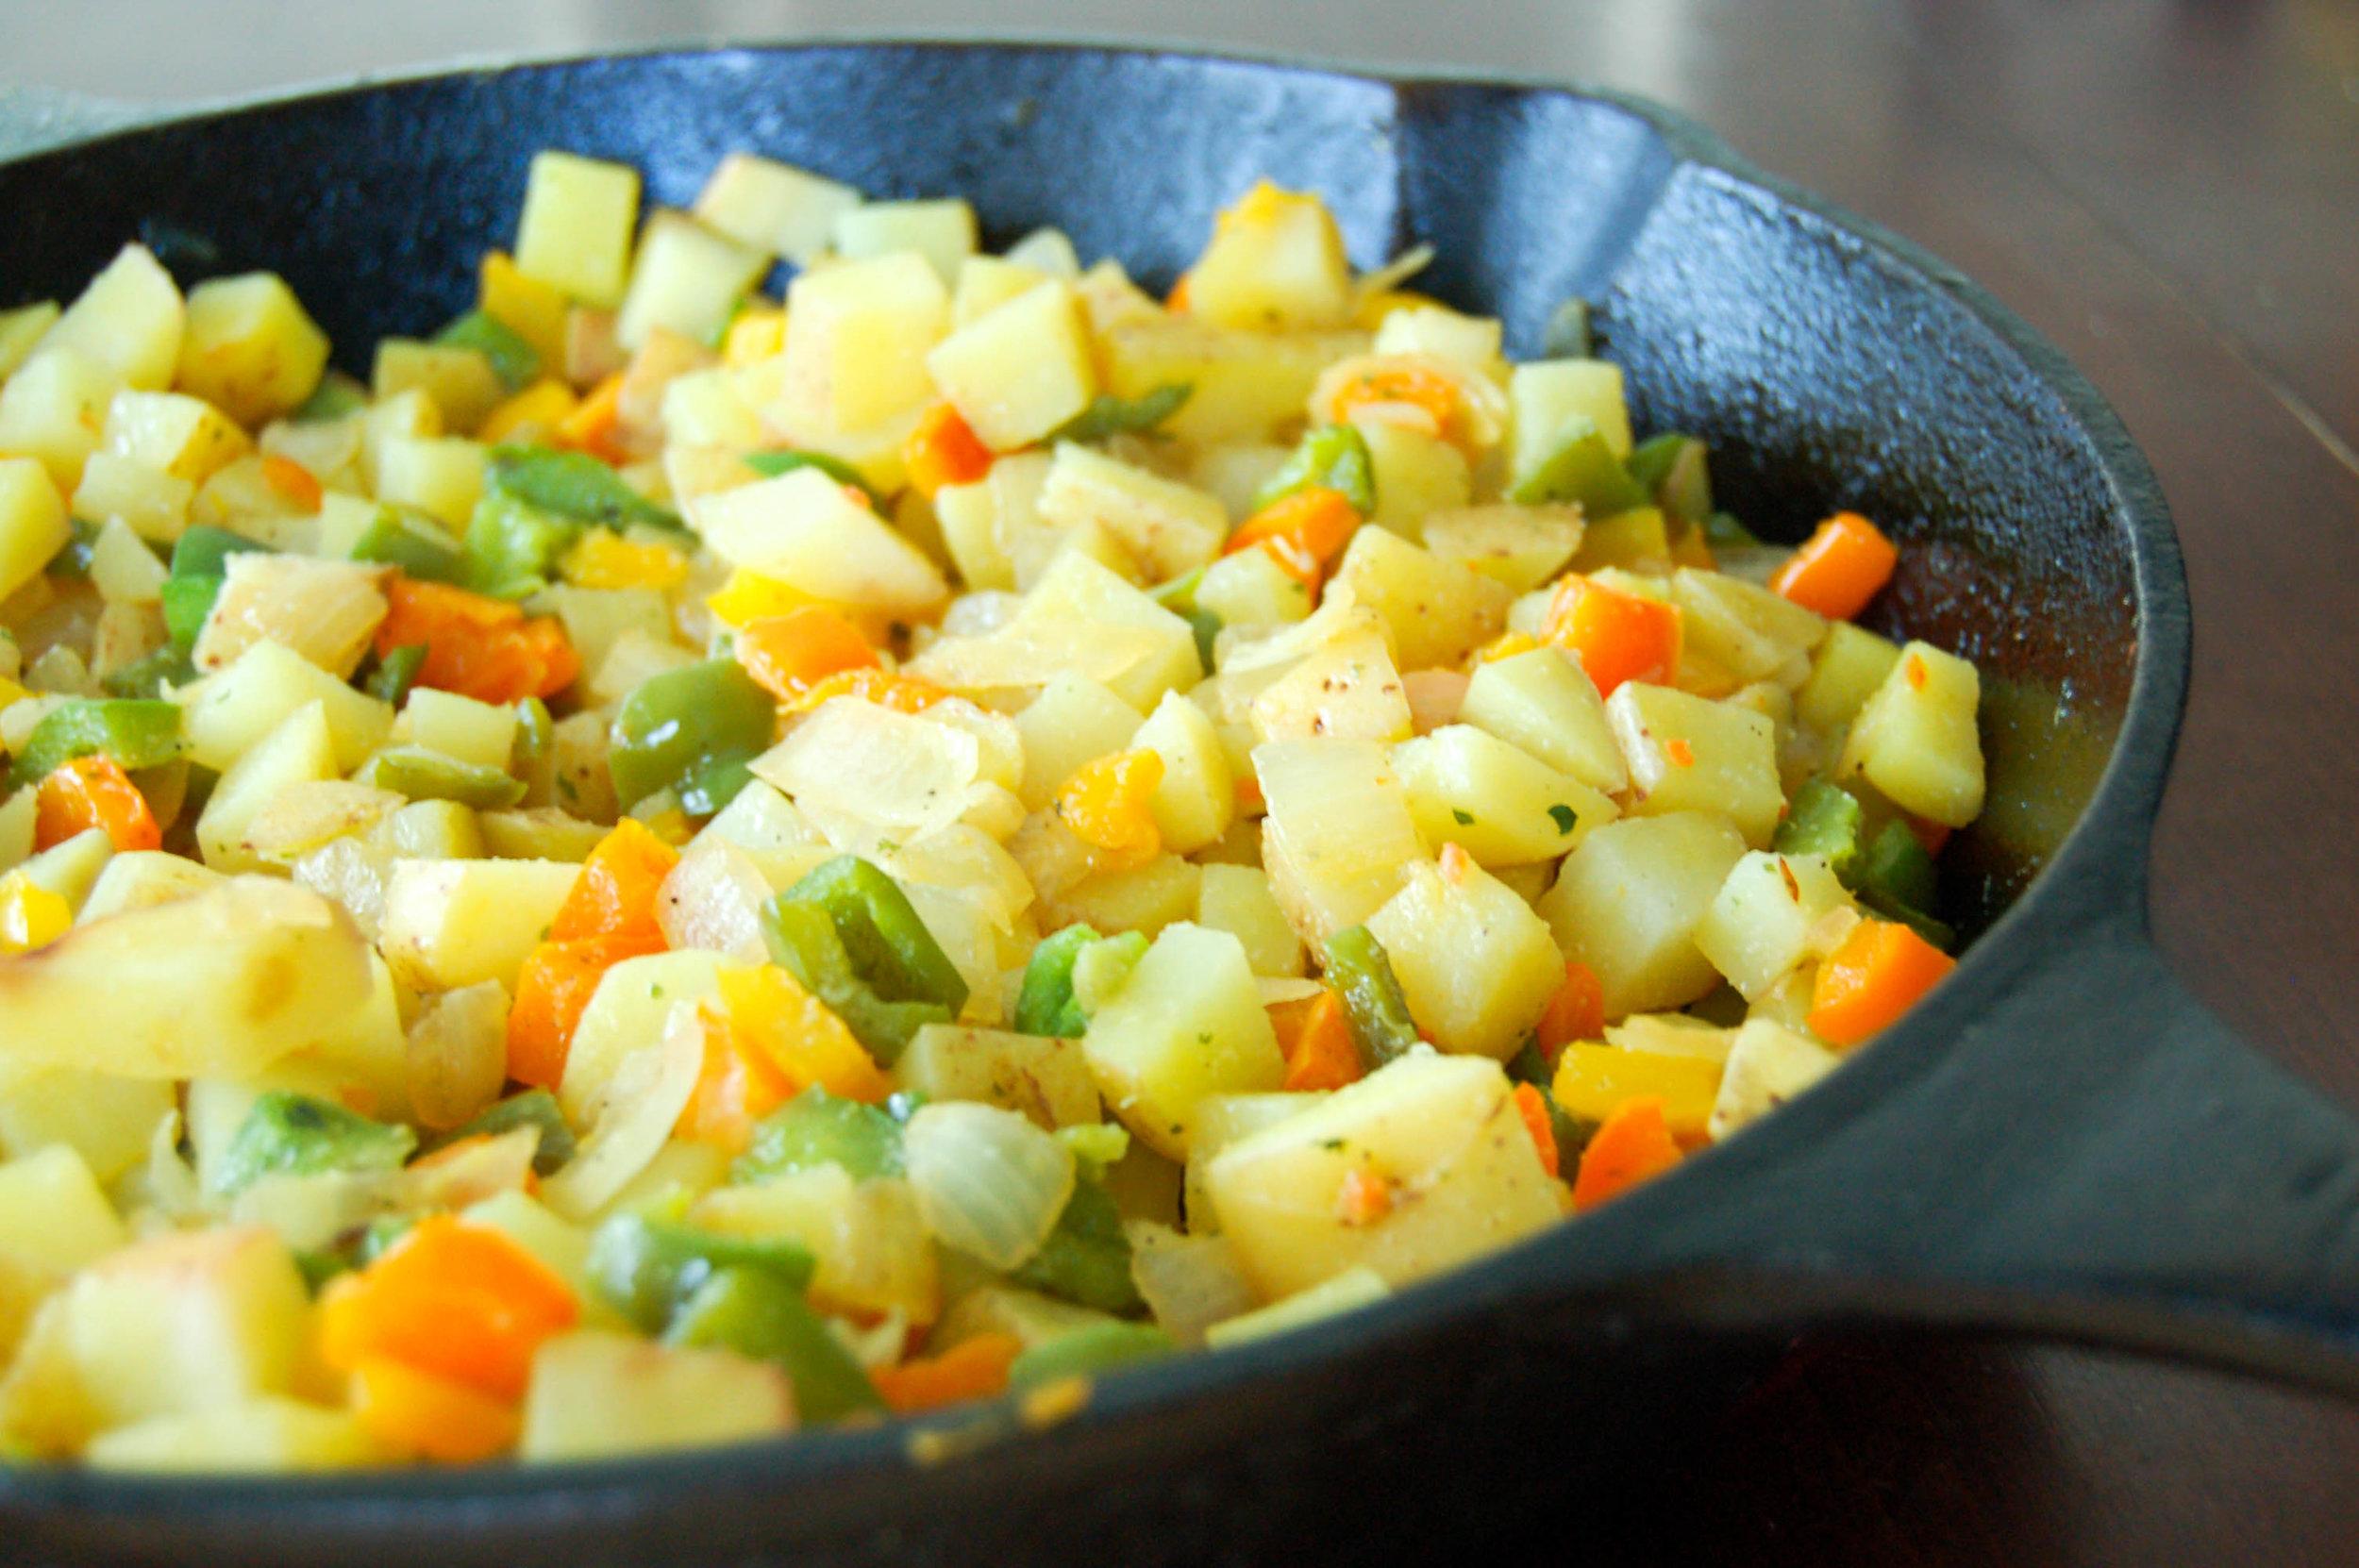 Homemade Potatoes O'Brien Recipe